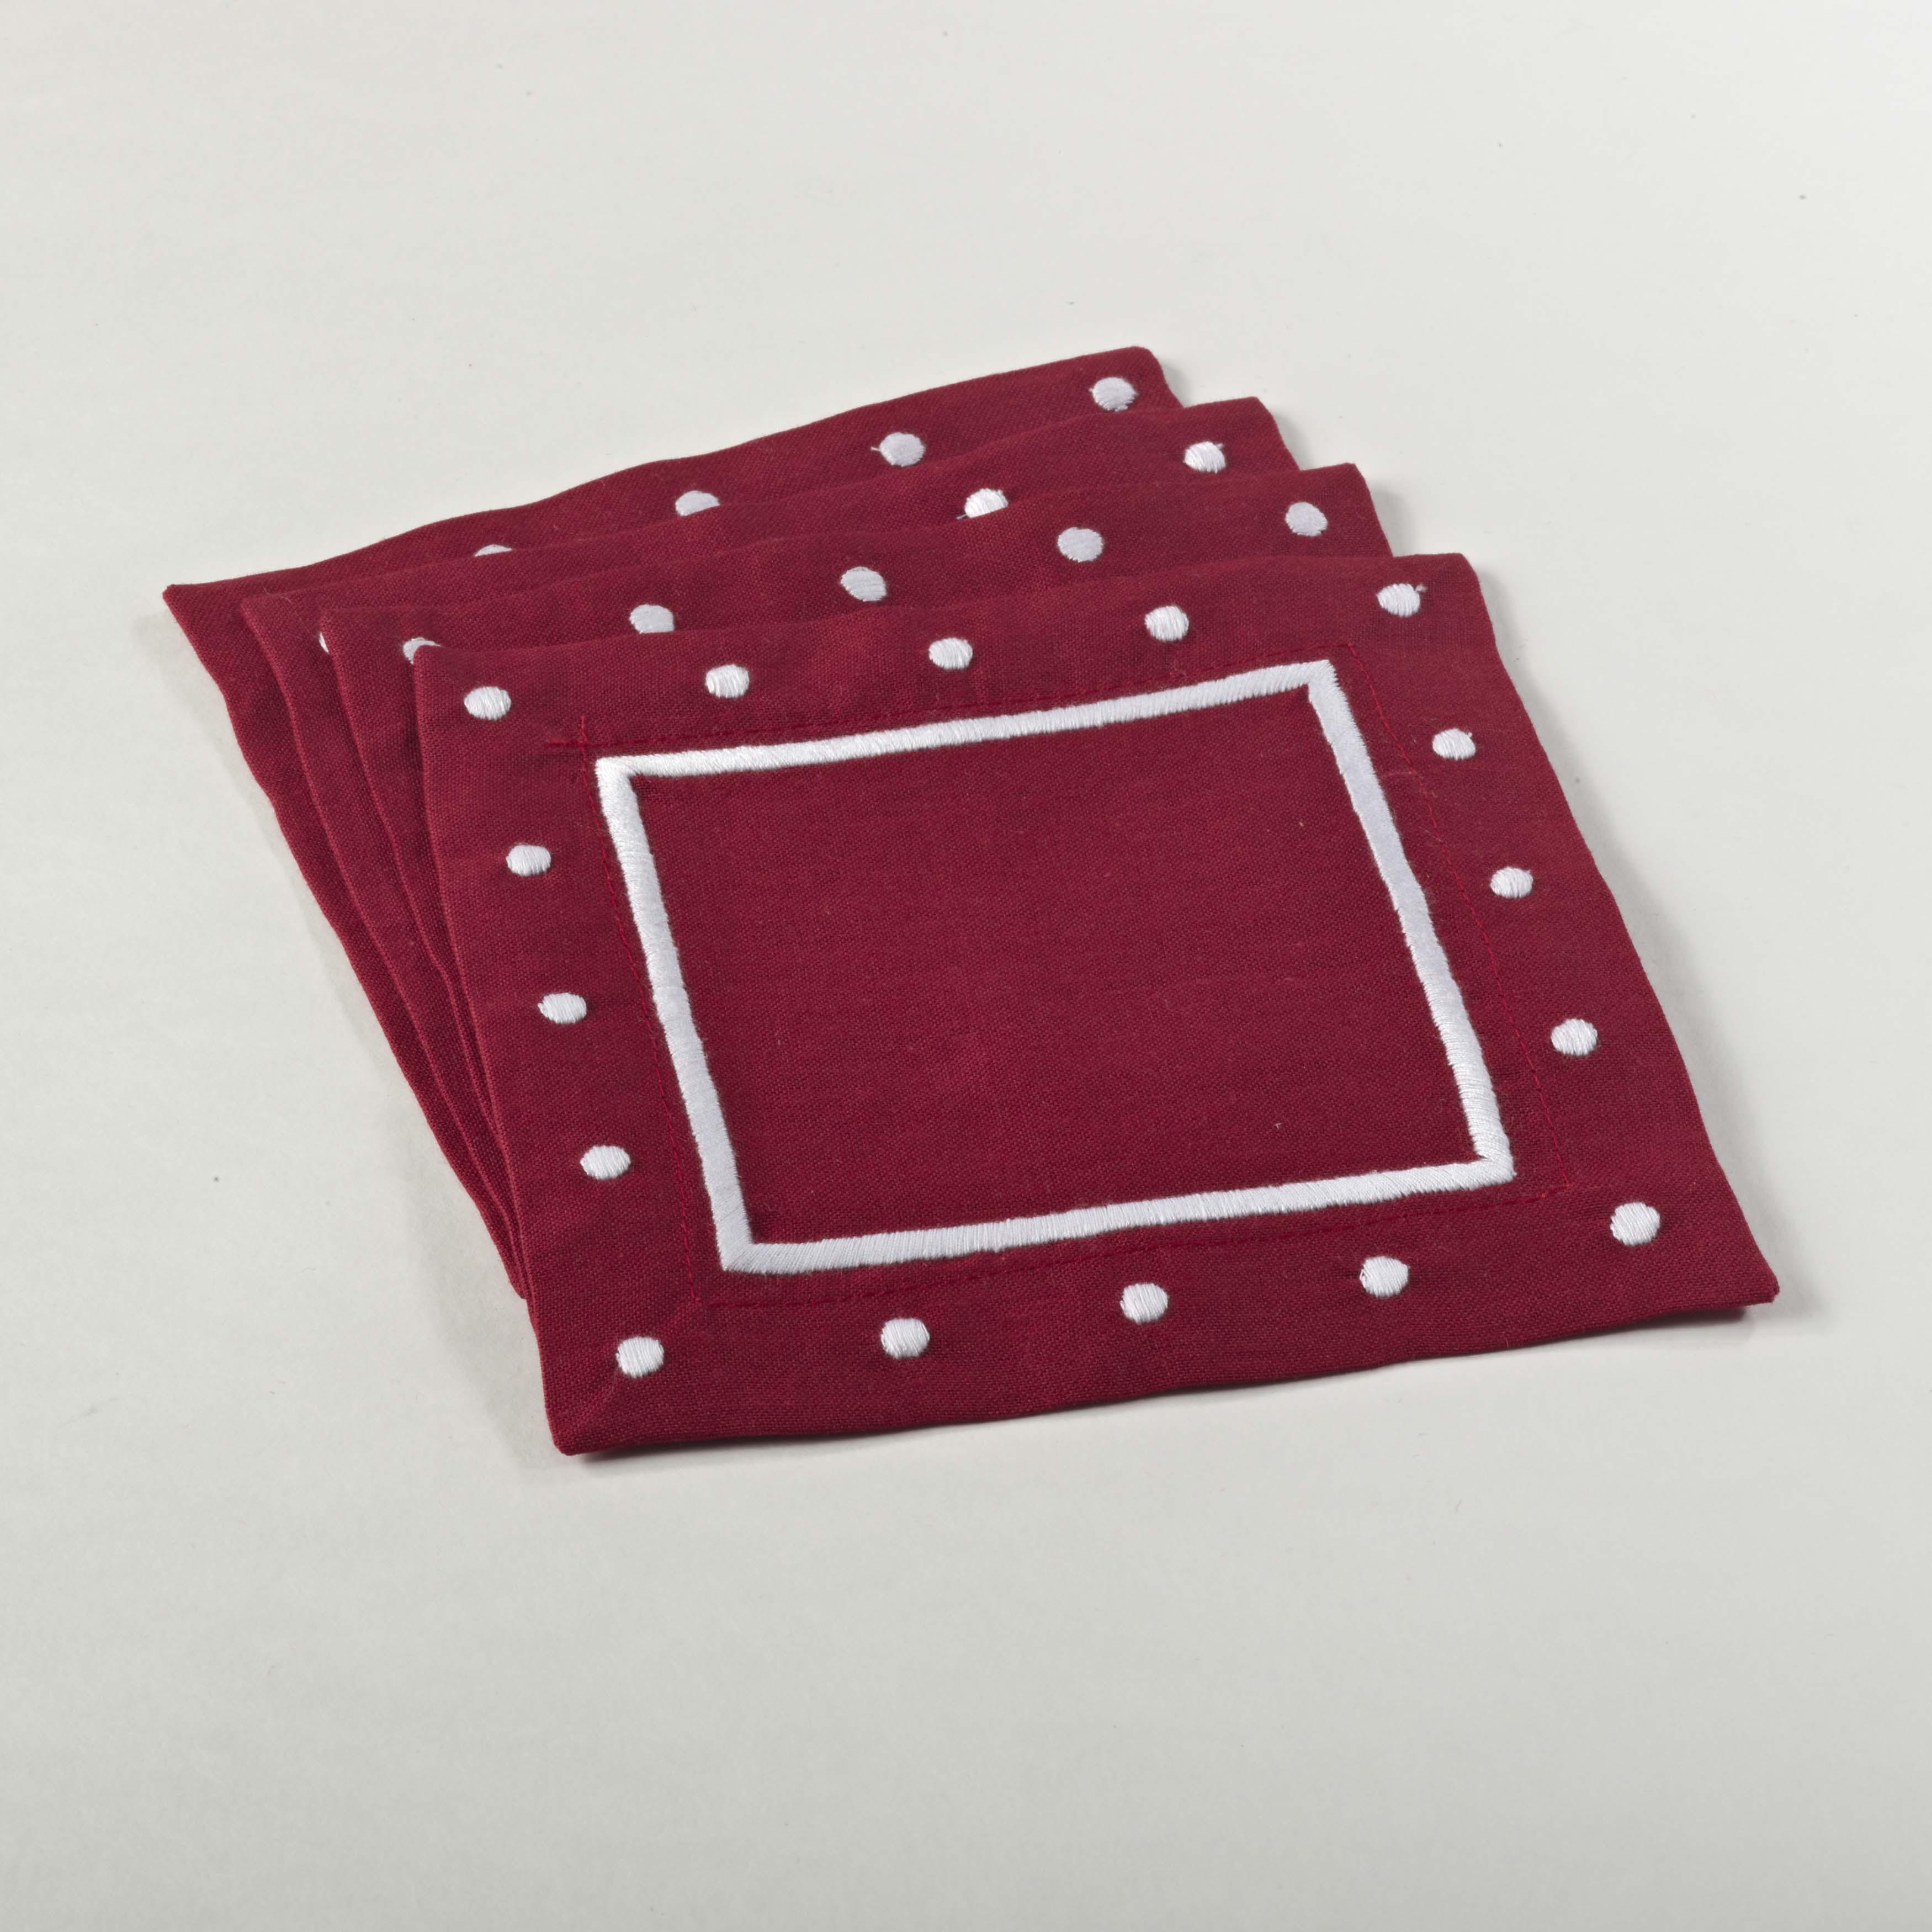 "Angelina Napkins Red 6"" Square Coaster (Set of 4) - Saro Lifestyle 0551.R6S"